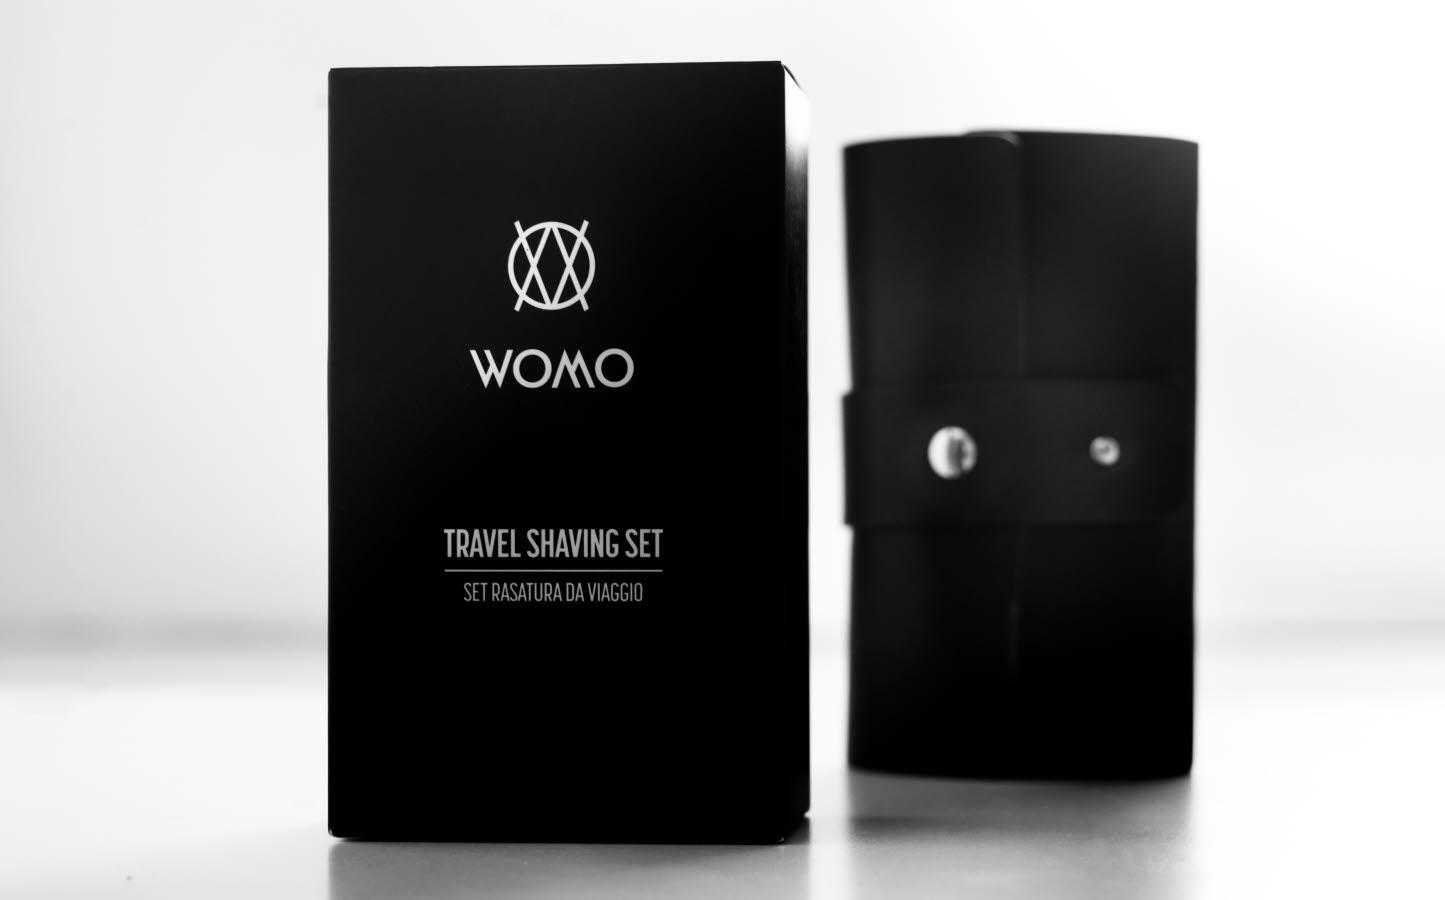 WOMO travel shaving kit packaging